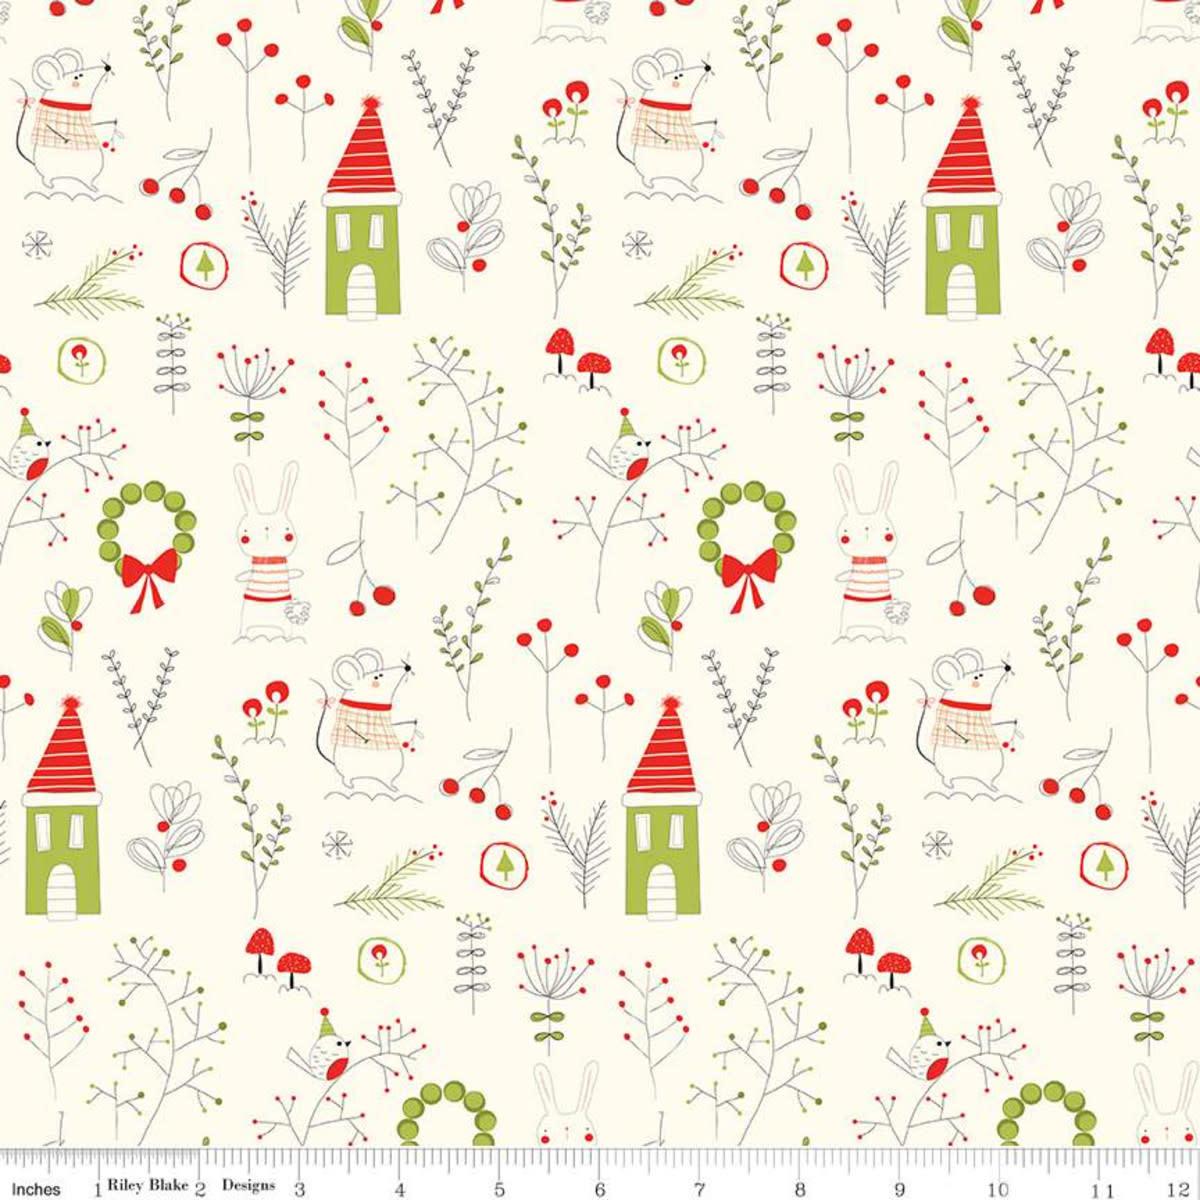 RILEY BLAKE DESIGNS MERRY LITTLE CHRISTMAS, MAIN, CREAM $0.20 /CM OR $20/M